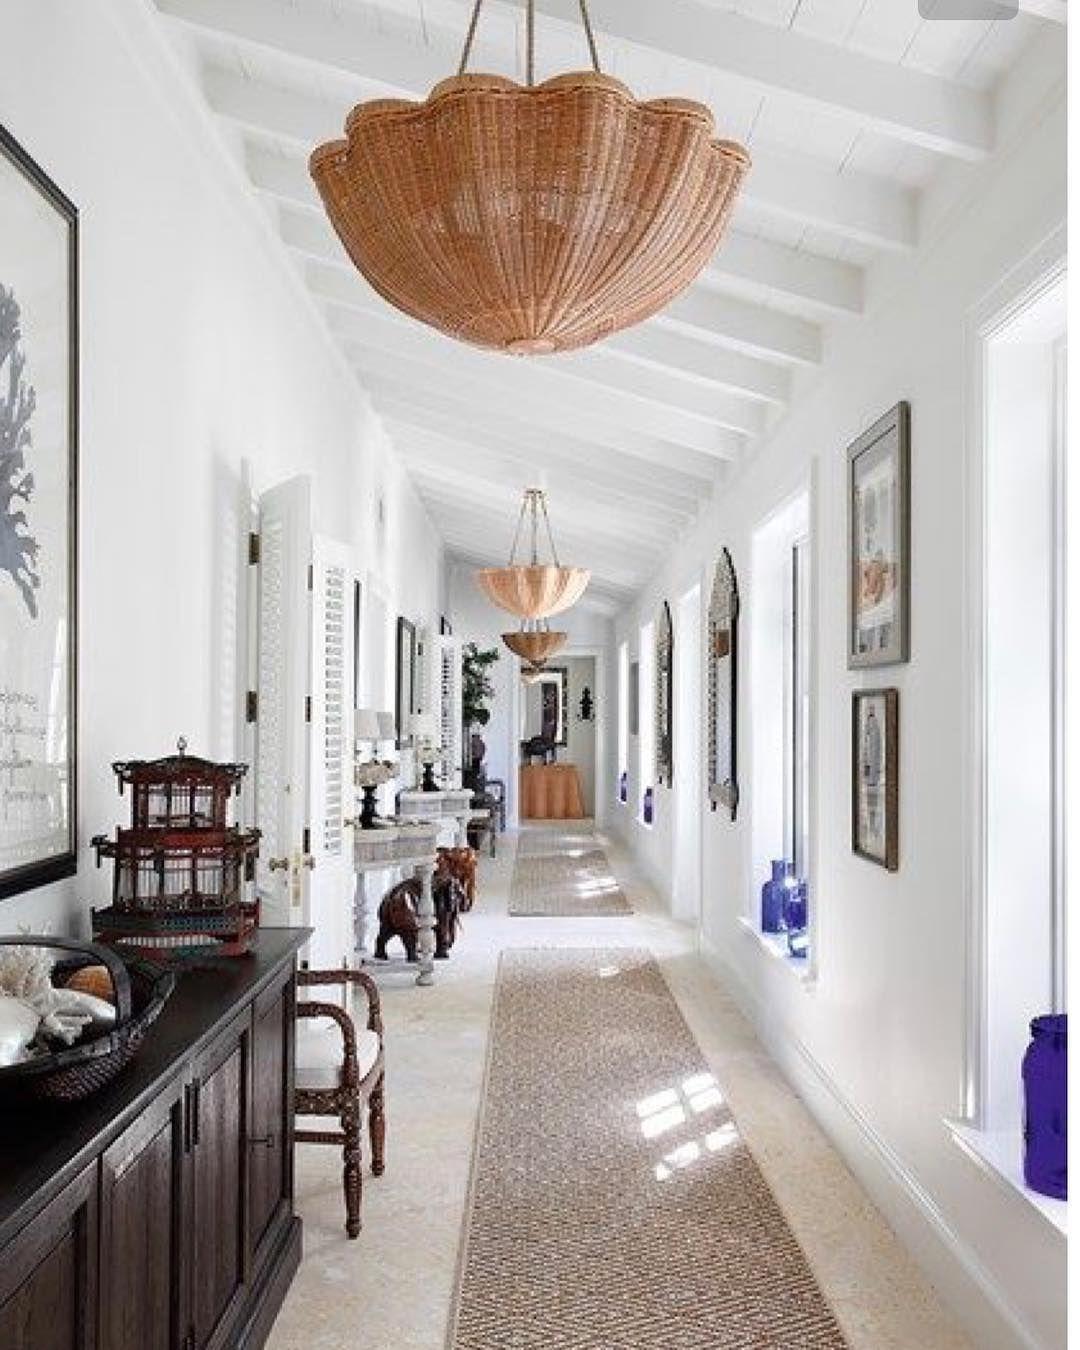 Bahamas Beach House: Interior Style - British Colonial